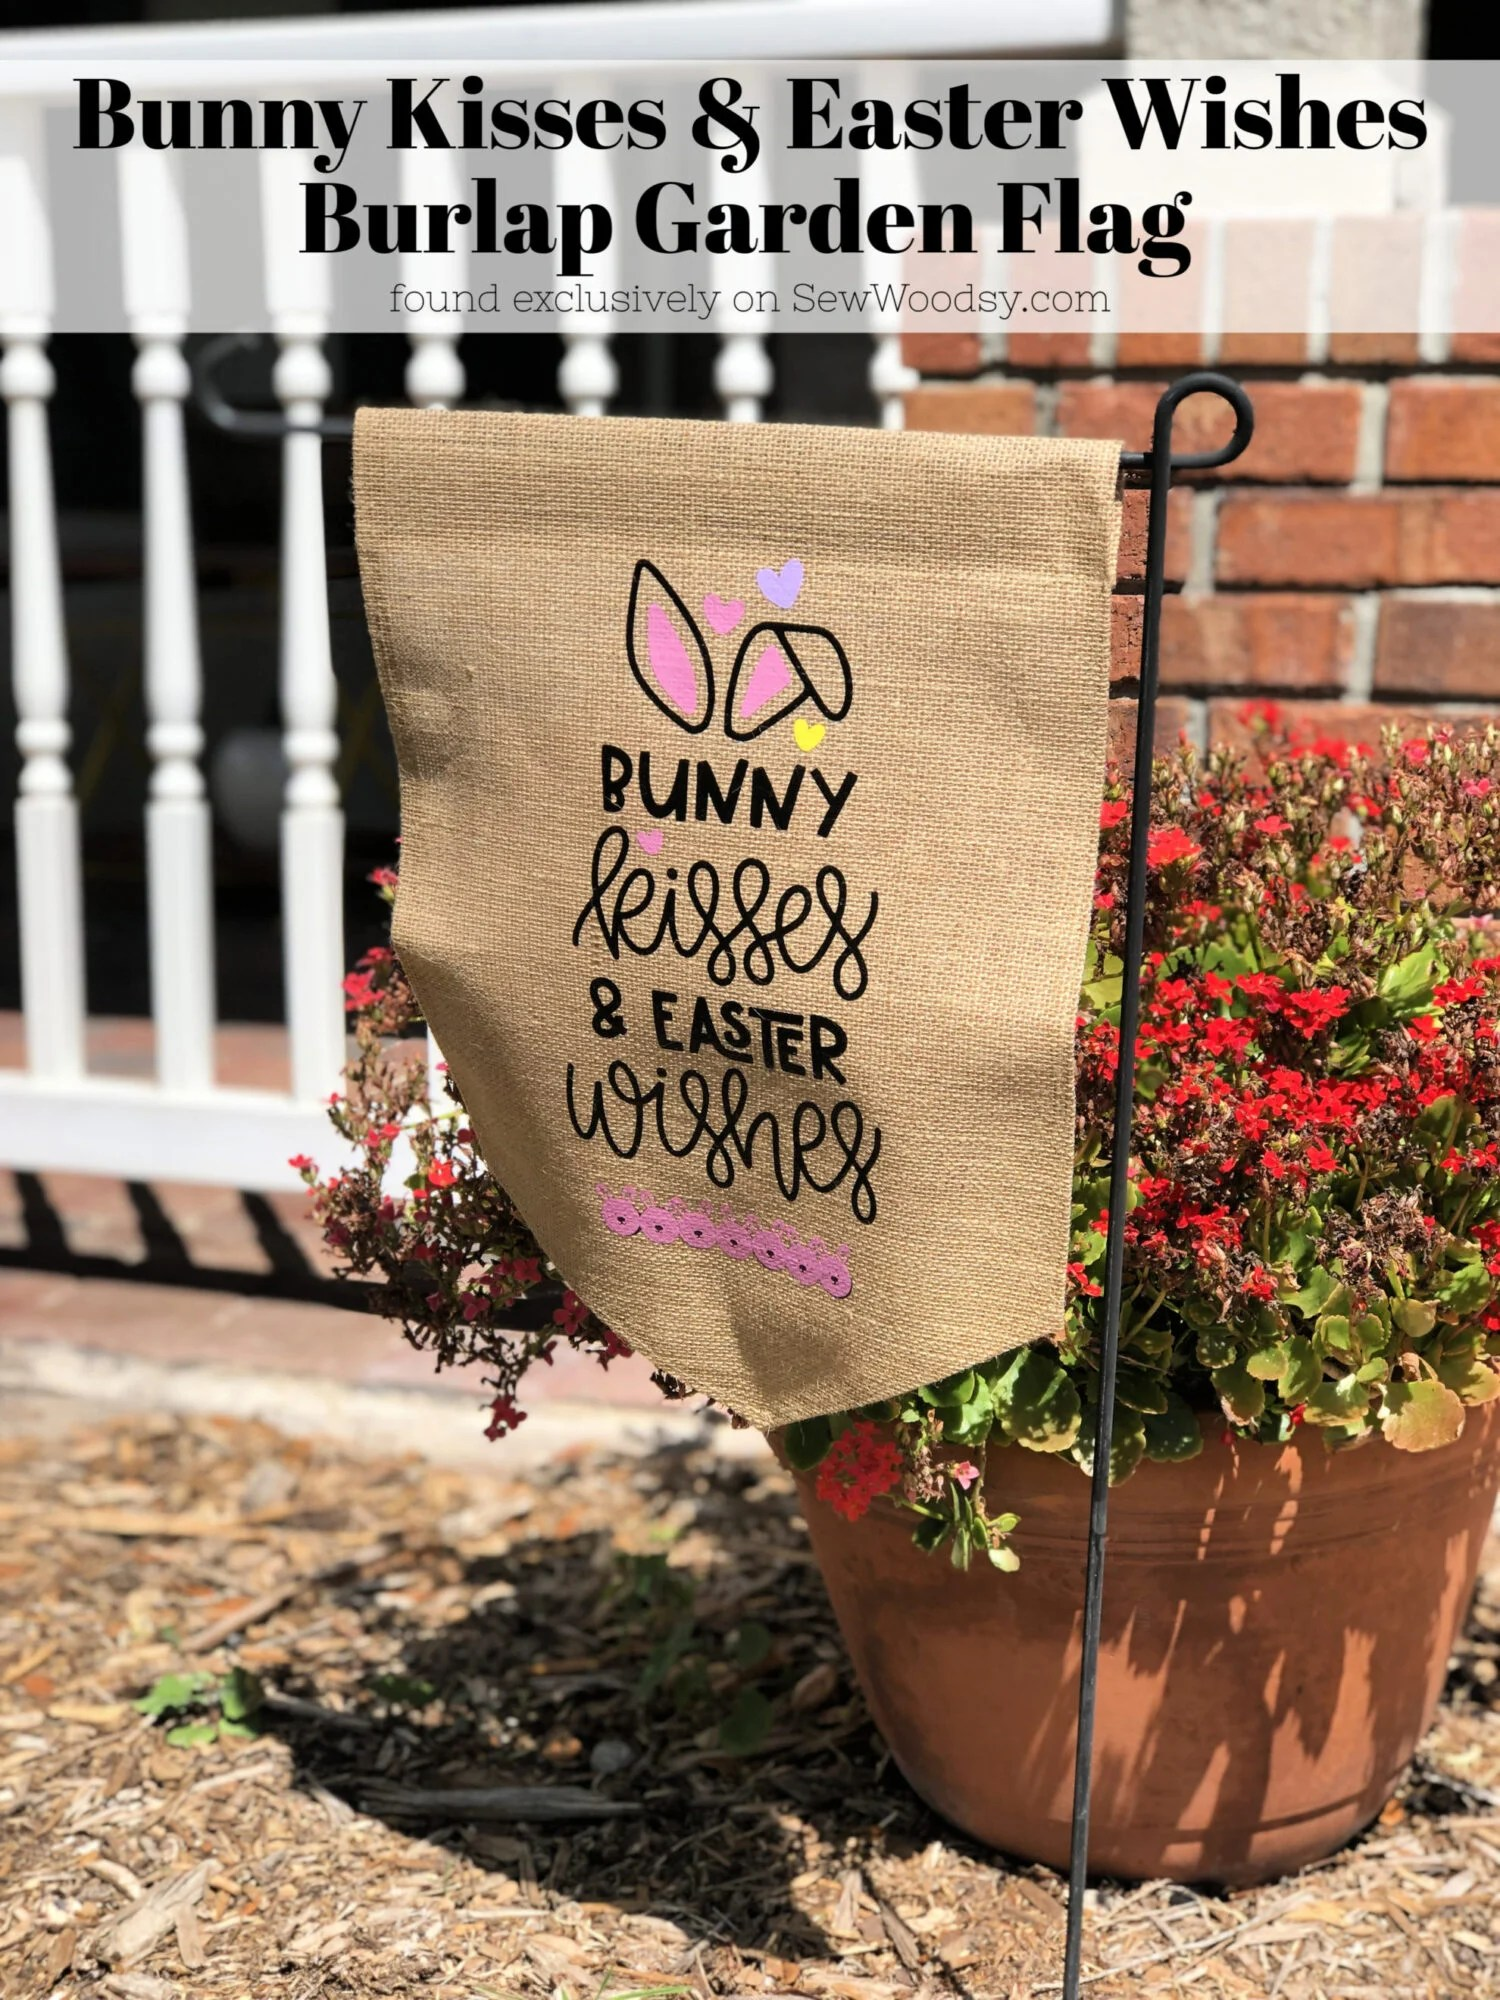 Bunny Kisses & Easter Wishes Burlap Garden Flag